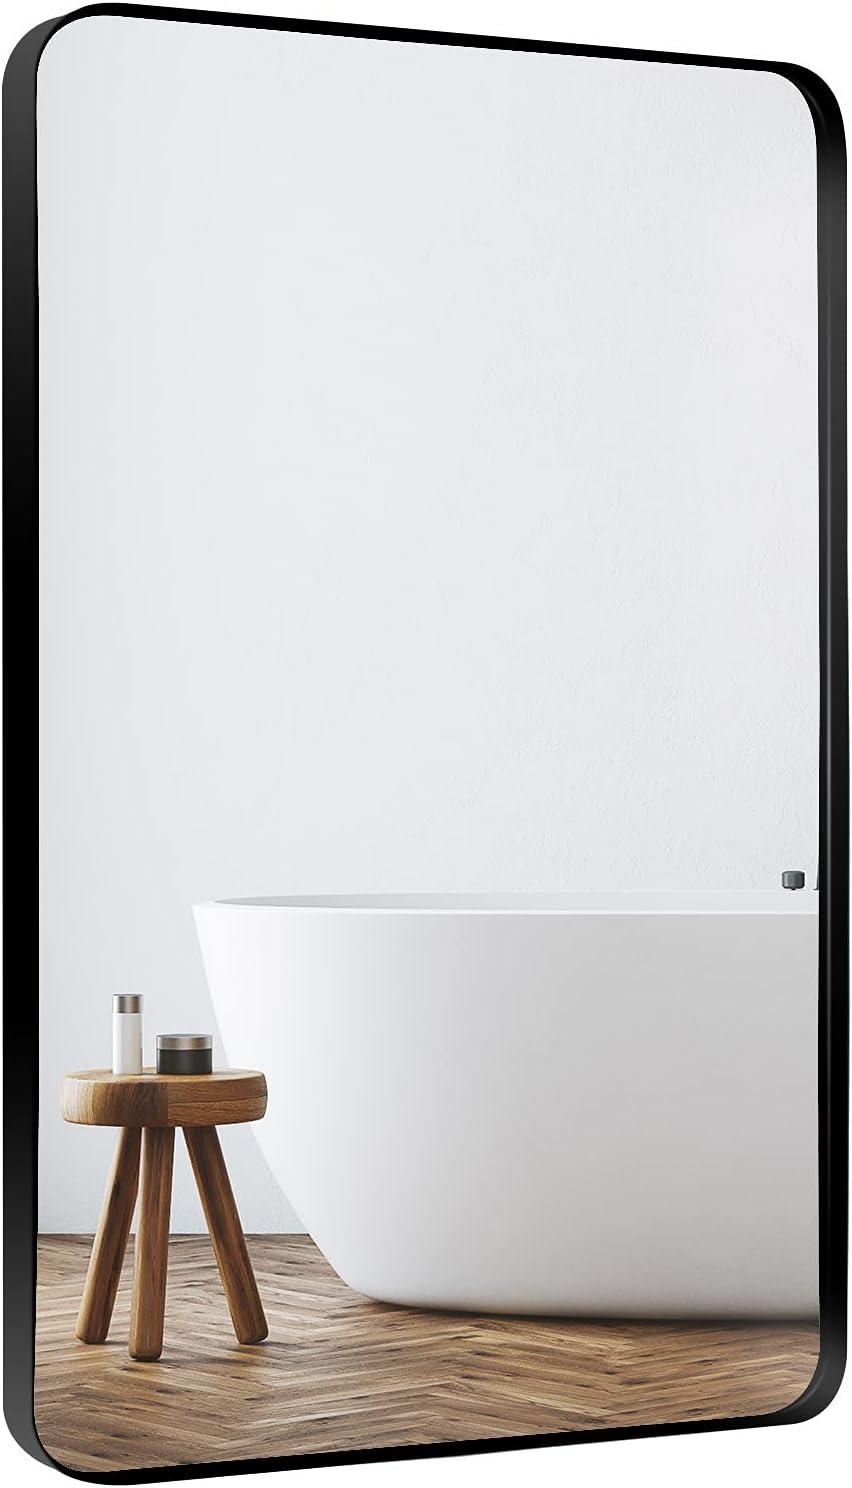 Buy Loaao Bathroom Mirrors For Wall 22x30 Rounded Rectangle Black Mirror Metal Framed Simple Modern Bathroom Vanity Mirror Anti Rust Shatter Proof Matte Finish Hangs Horizontal Or Vertical Online In Germany B08vhtfxp9